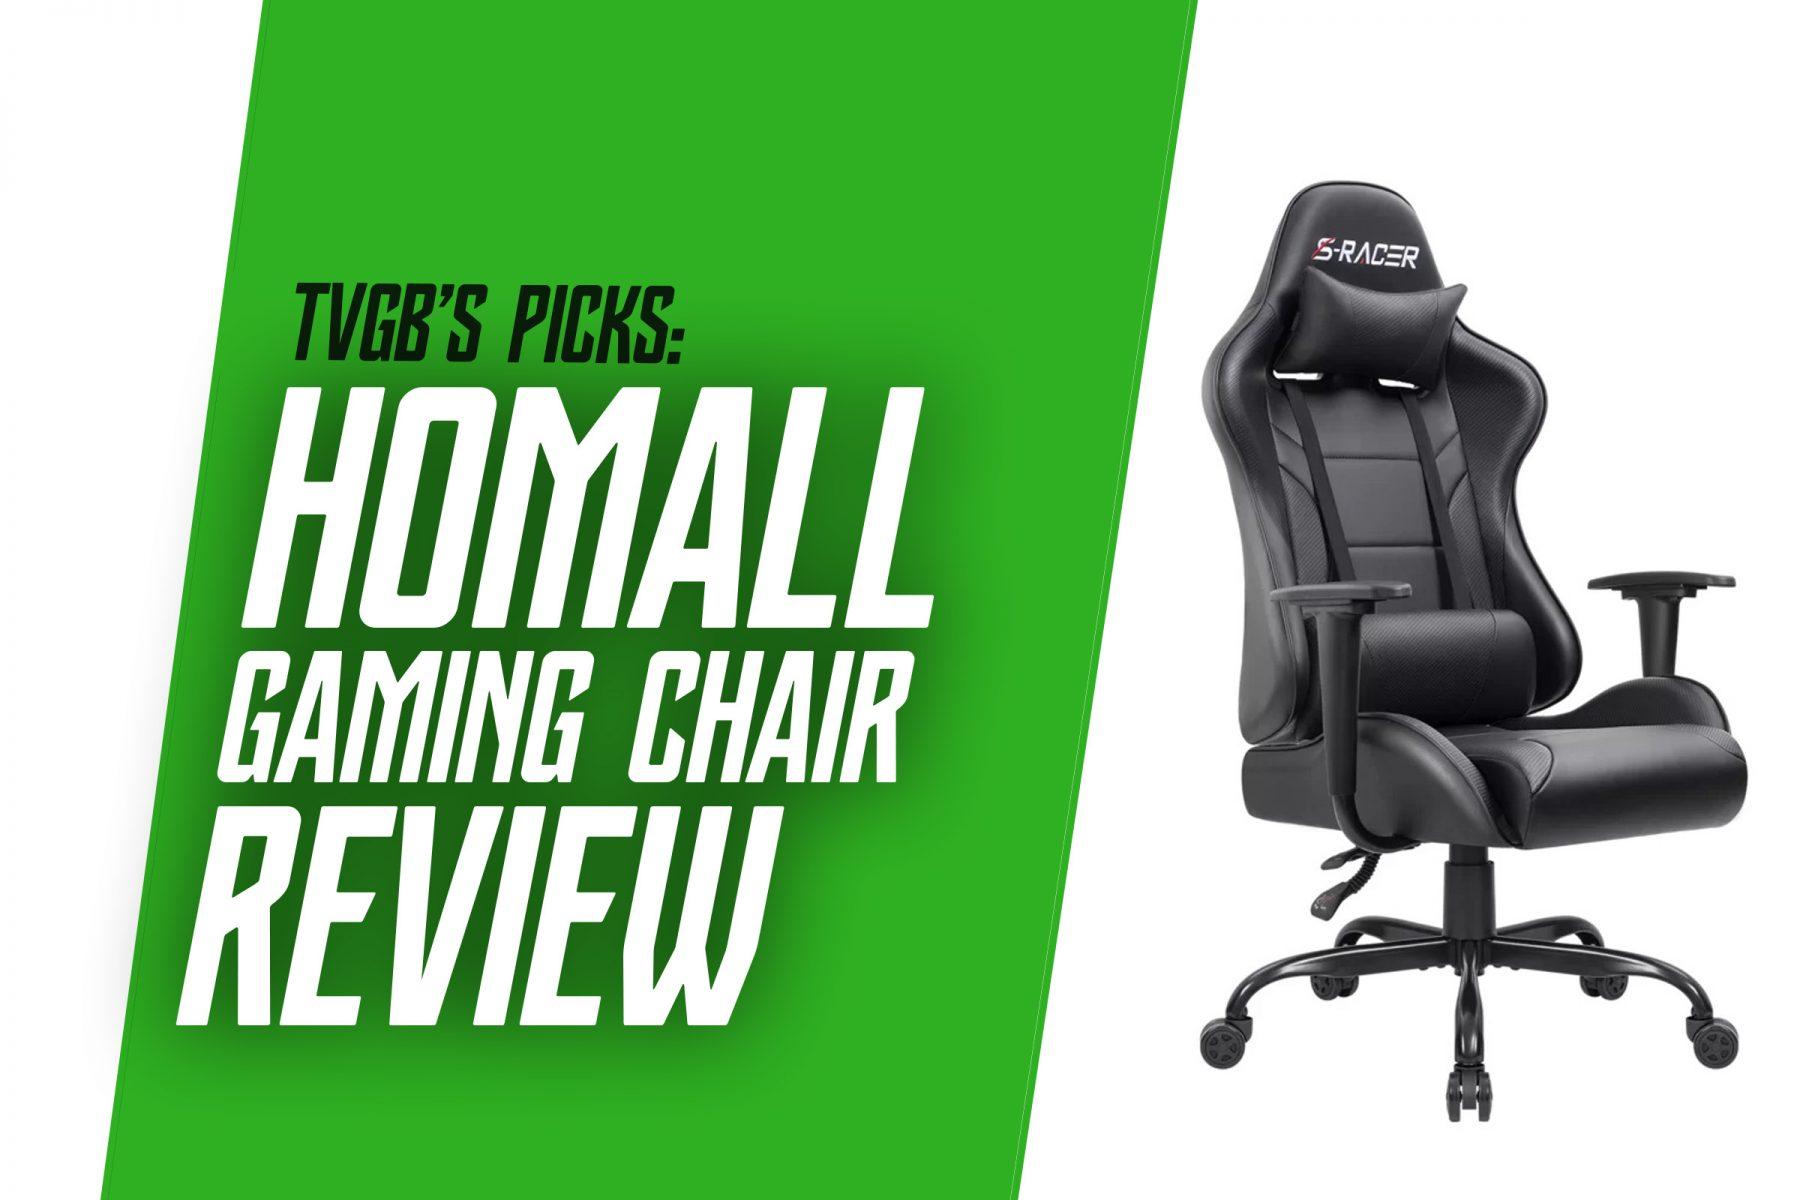 TVGB - homall gaming chair review